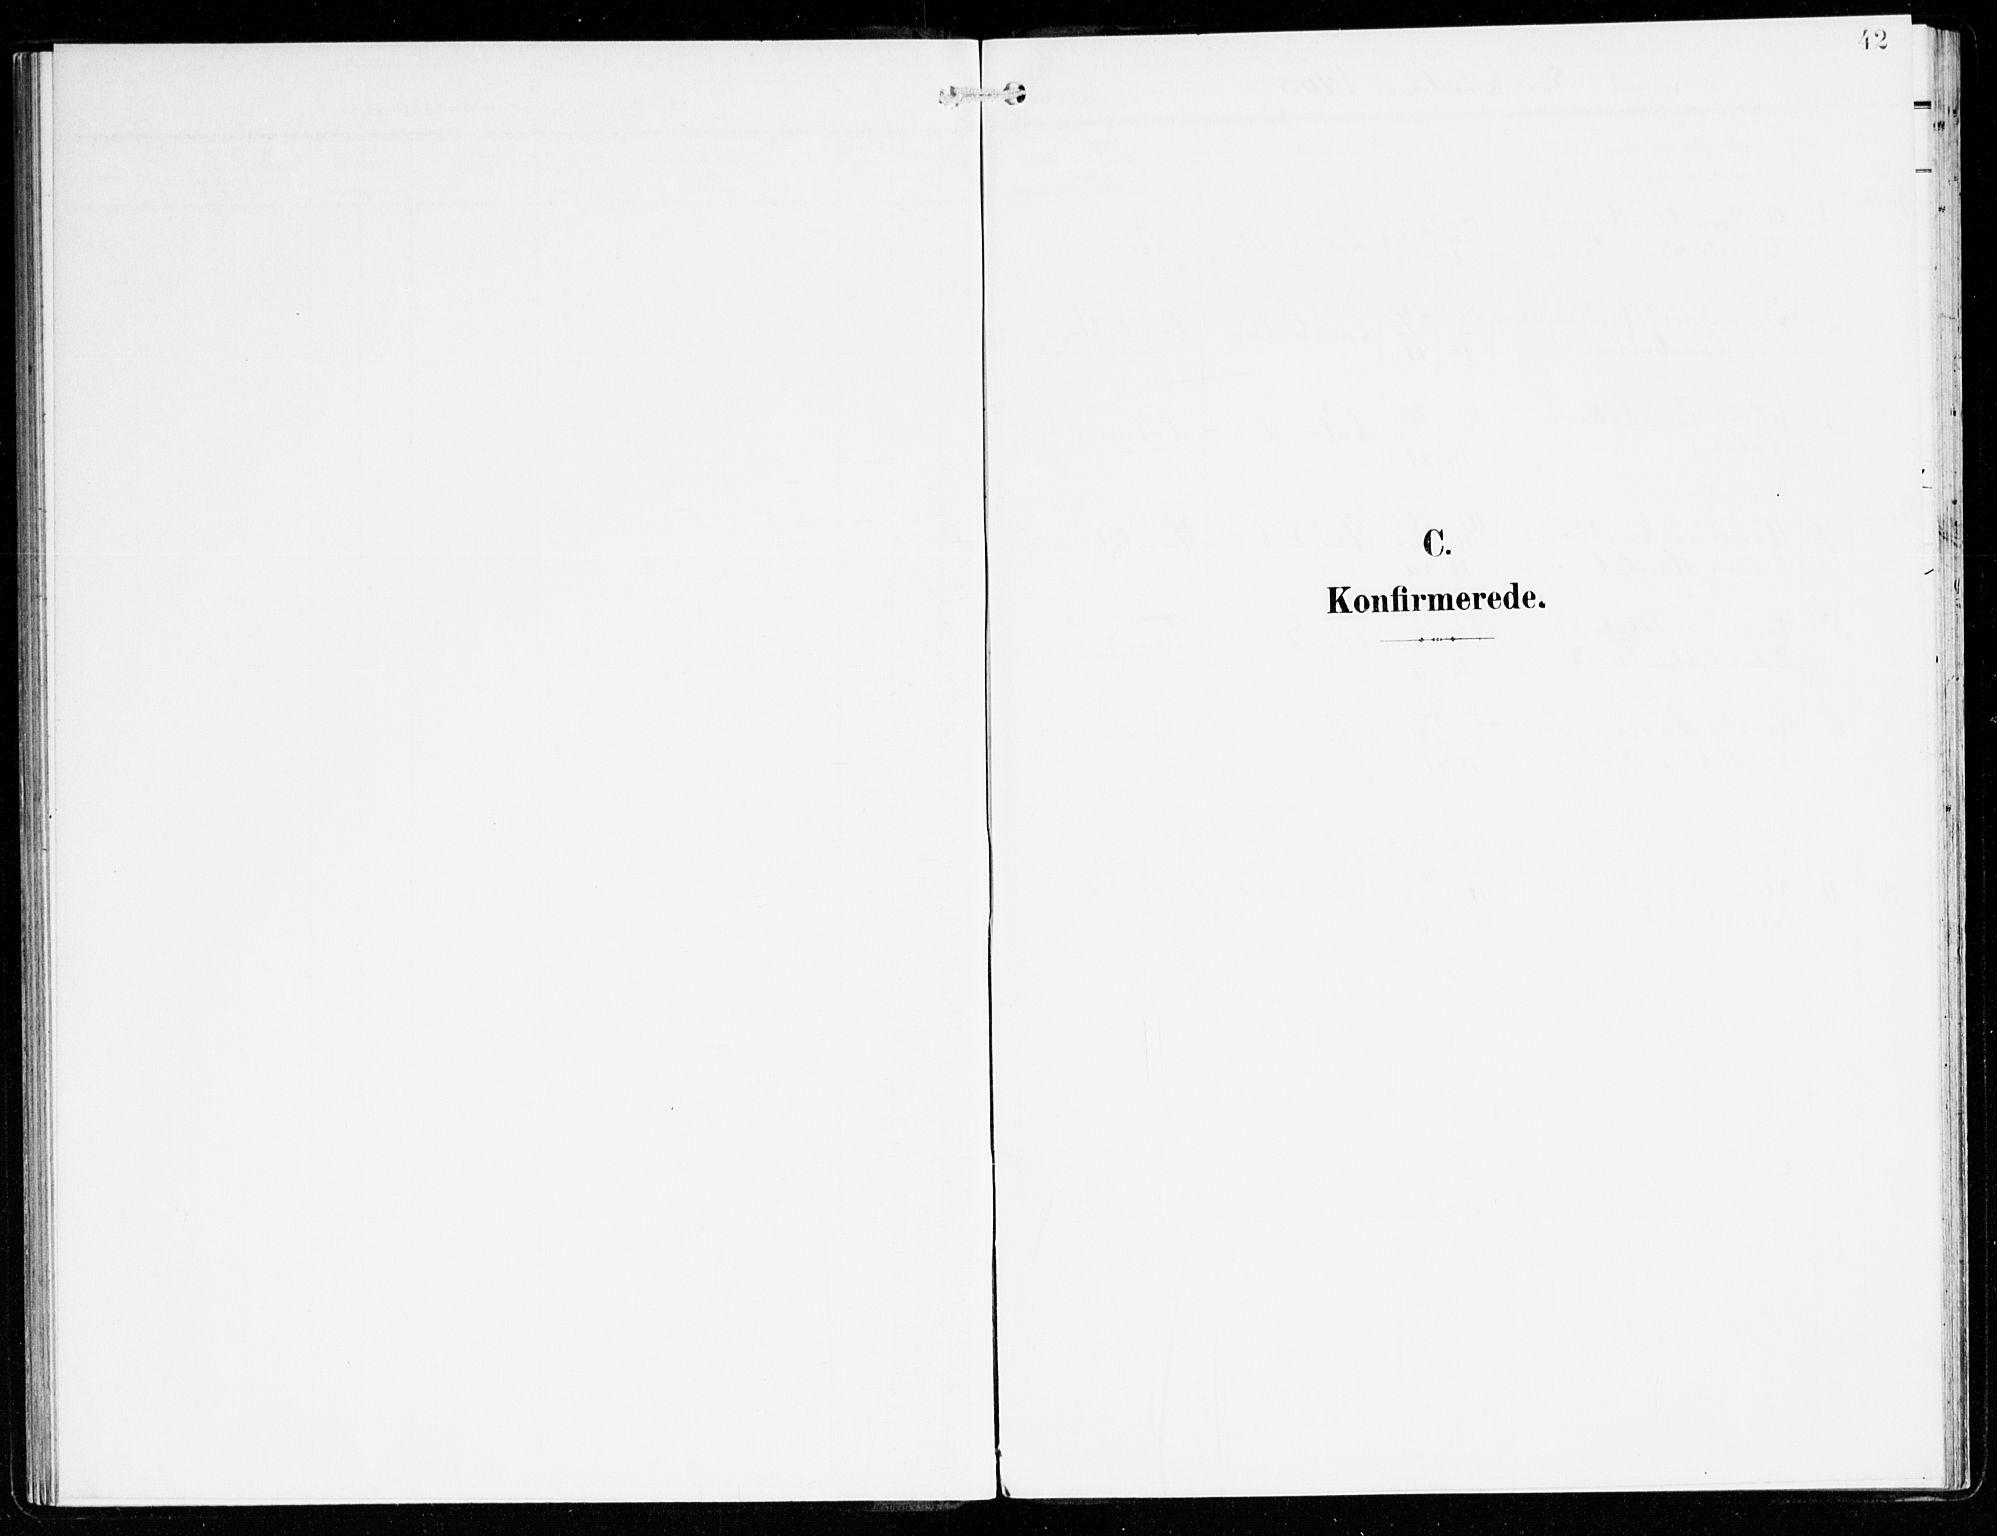 SAB, Hyllestad Sokneprestembete, Ministerialbok nr. C 2, 1904-1917, s. 42